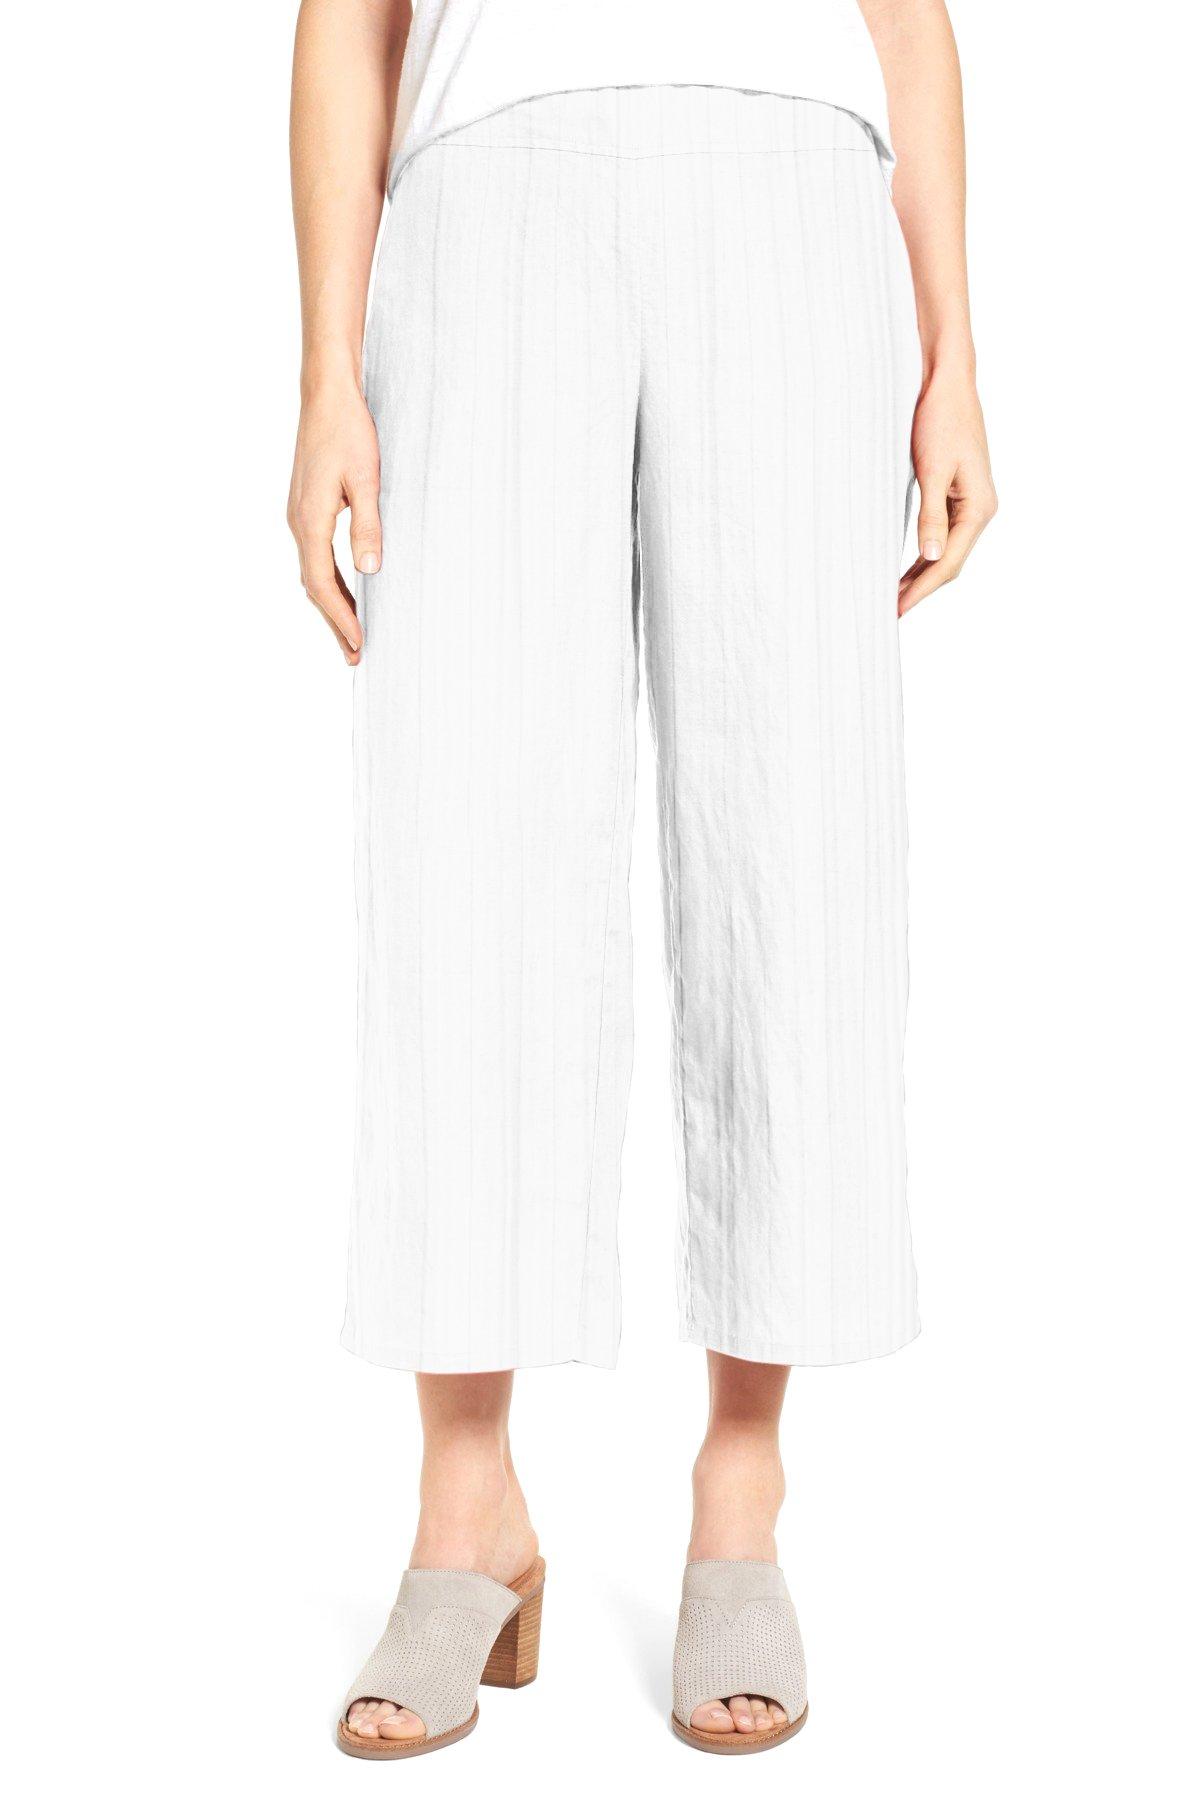 WuhouPro Women's Elastic Waist Wide Leg Pleated Crop Pants AZ 1400 White M